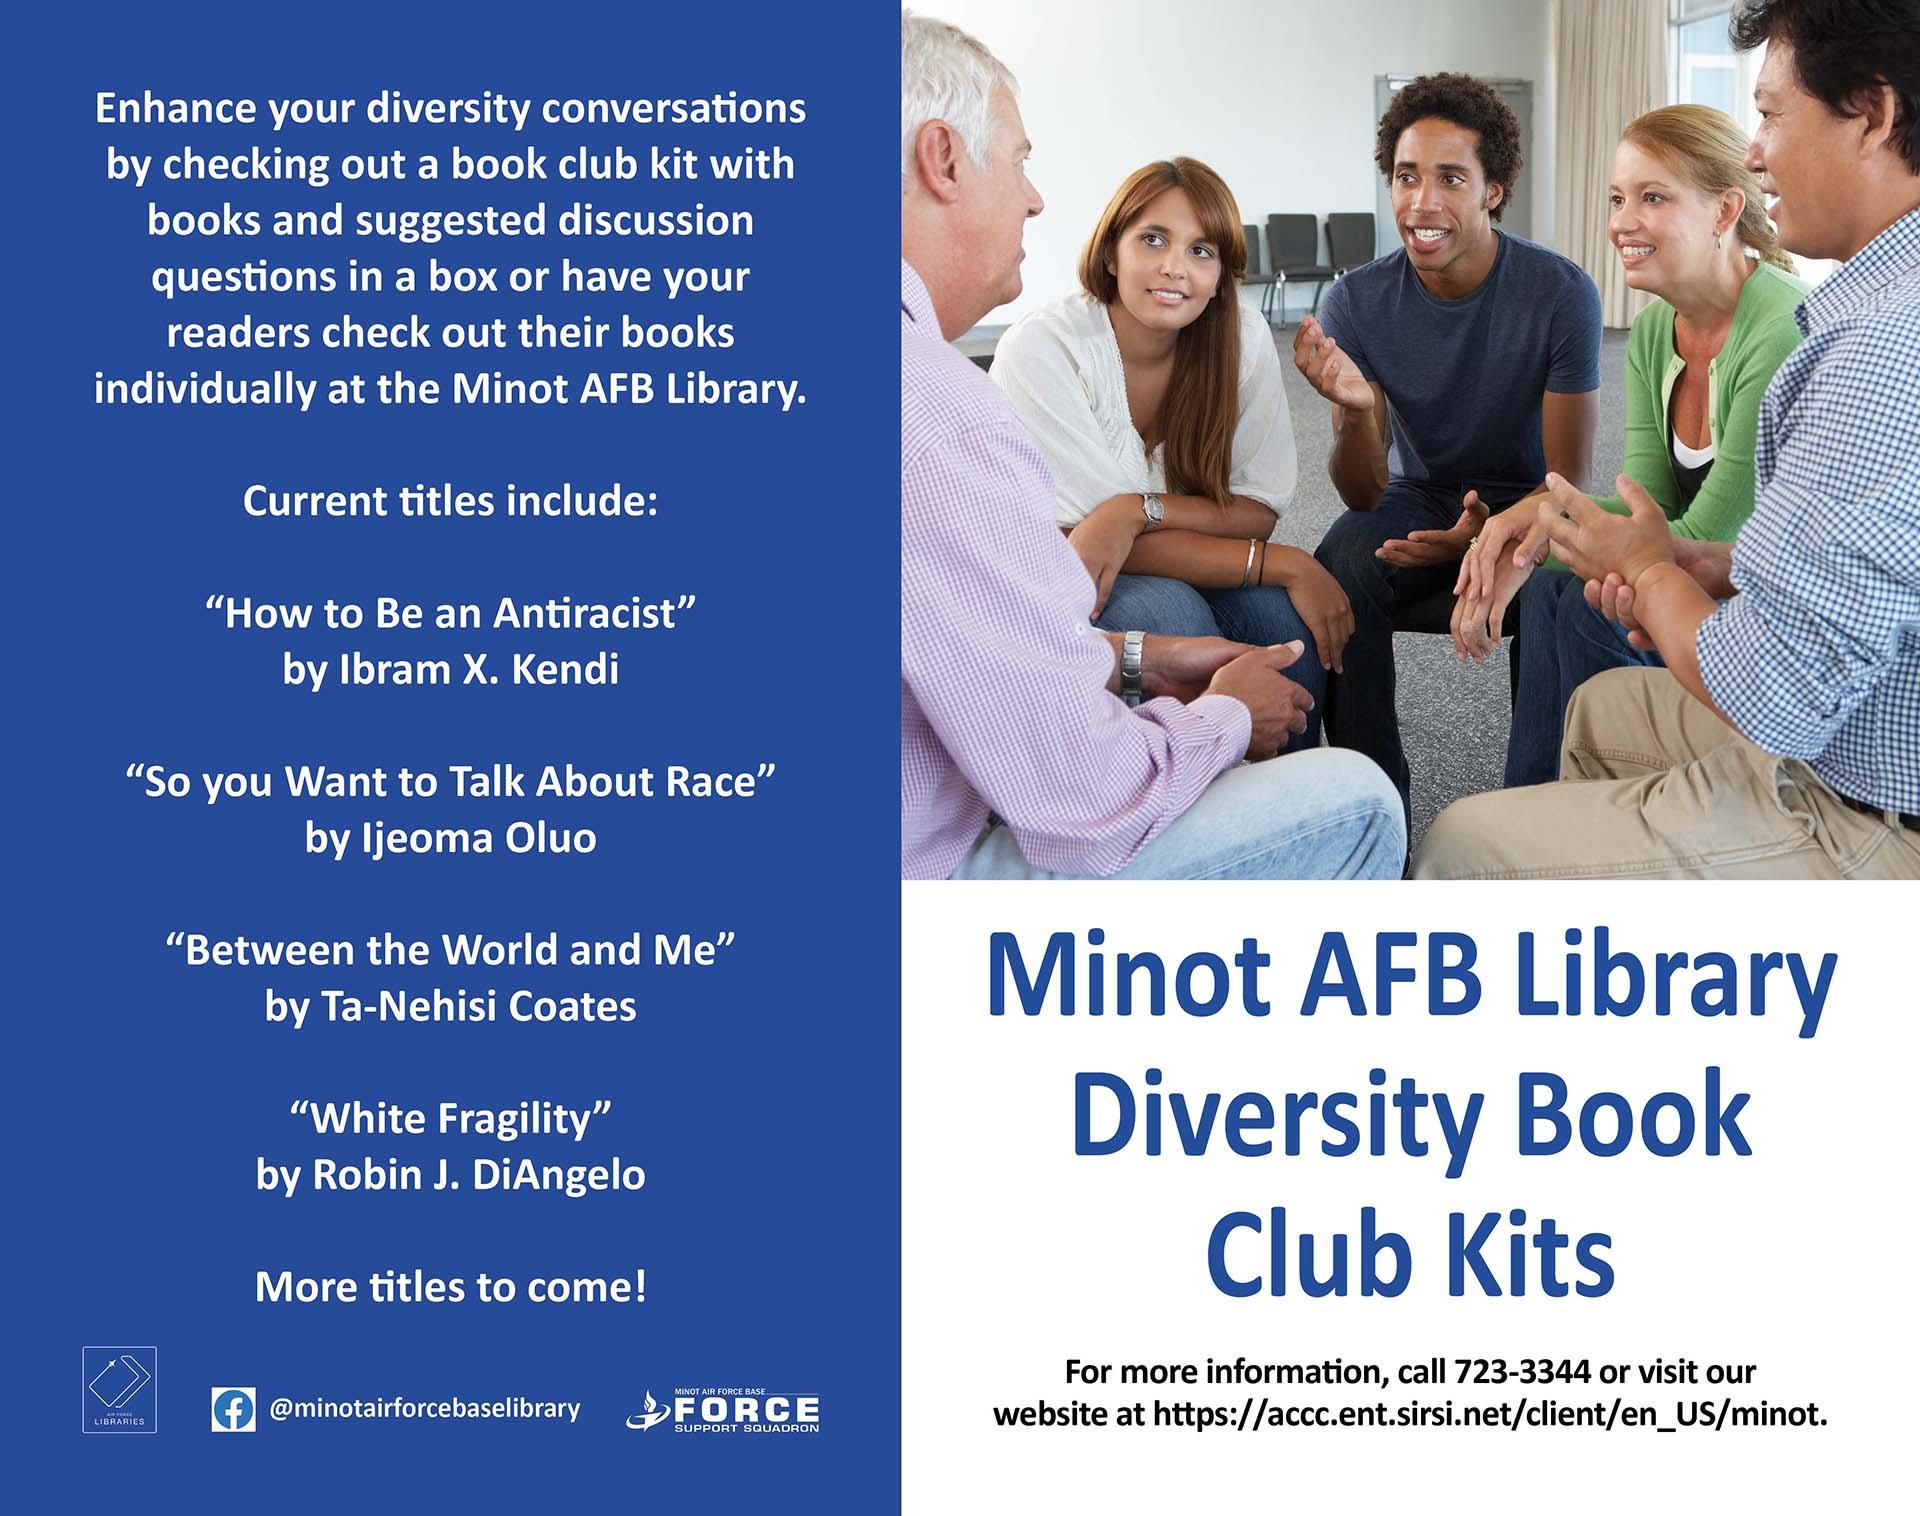 Library - Diversity Book Club Kits